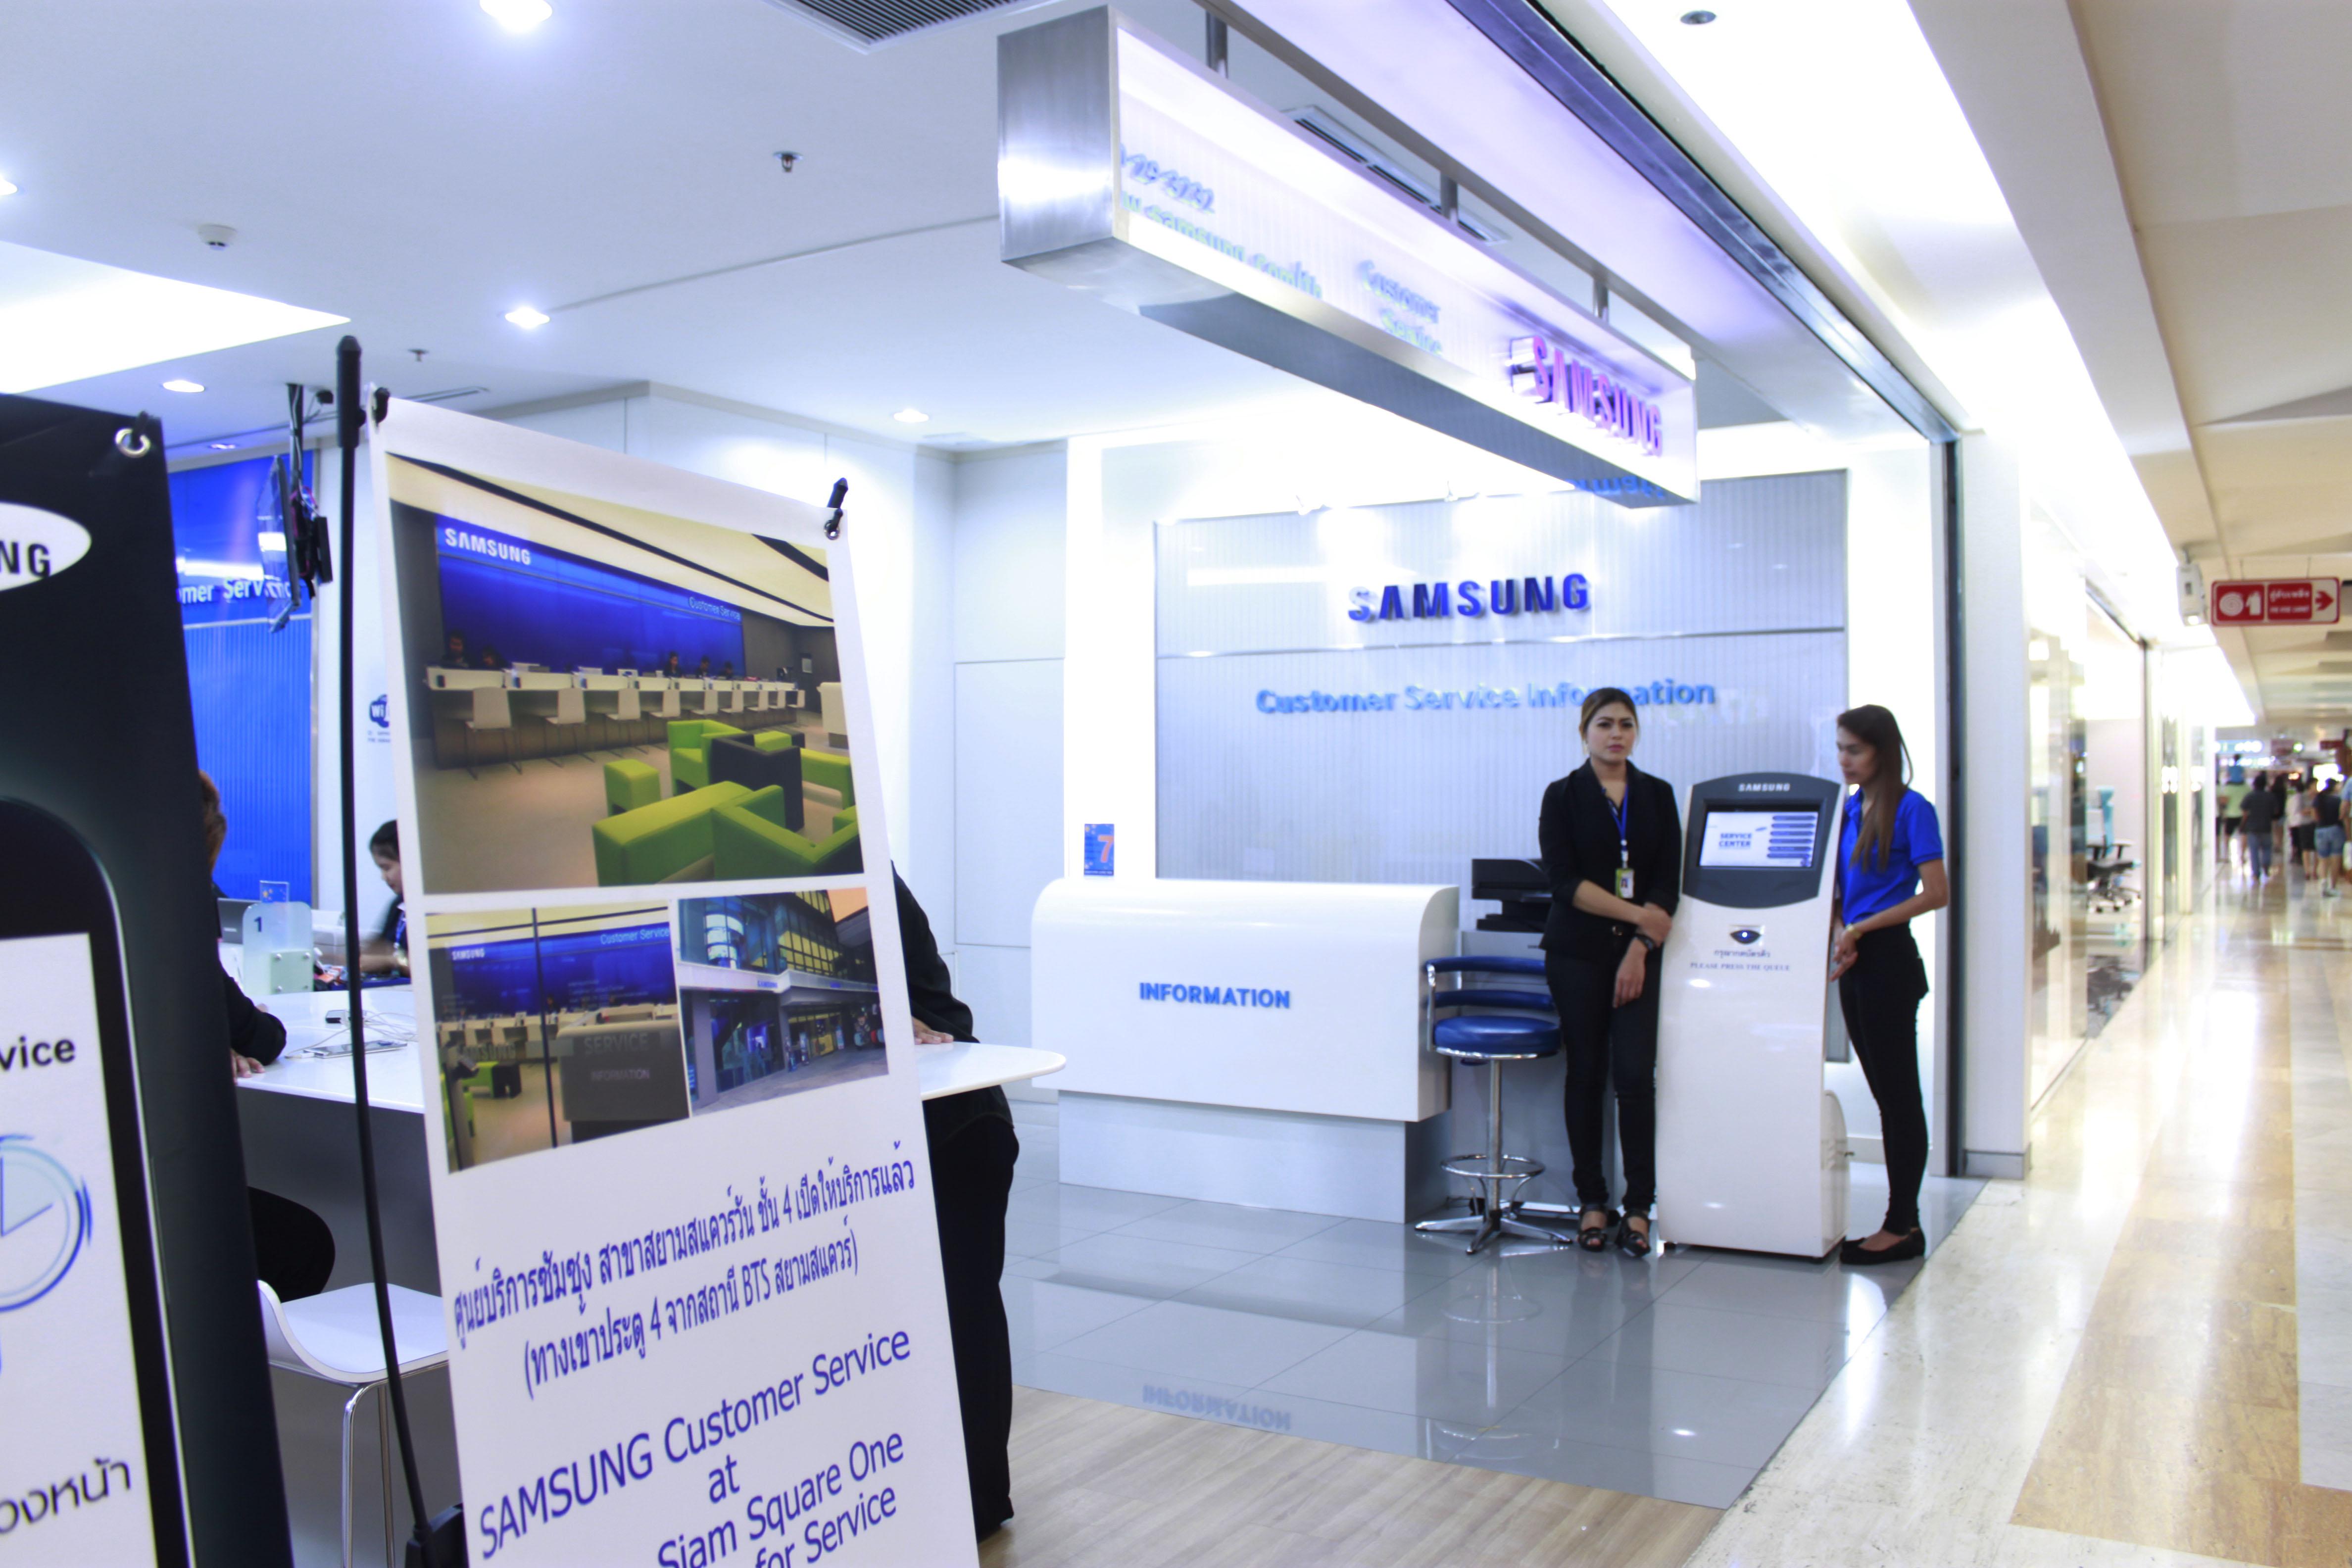 Samsung CS